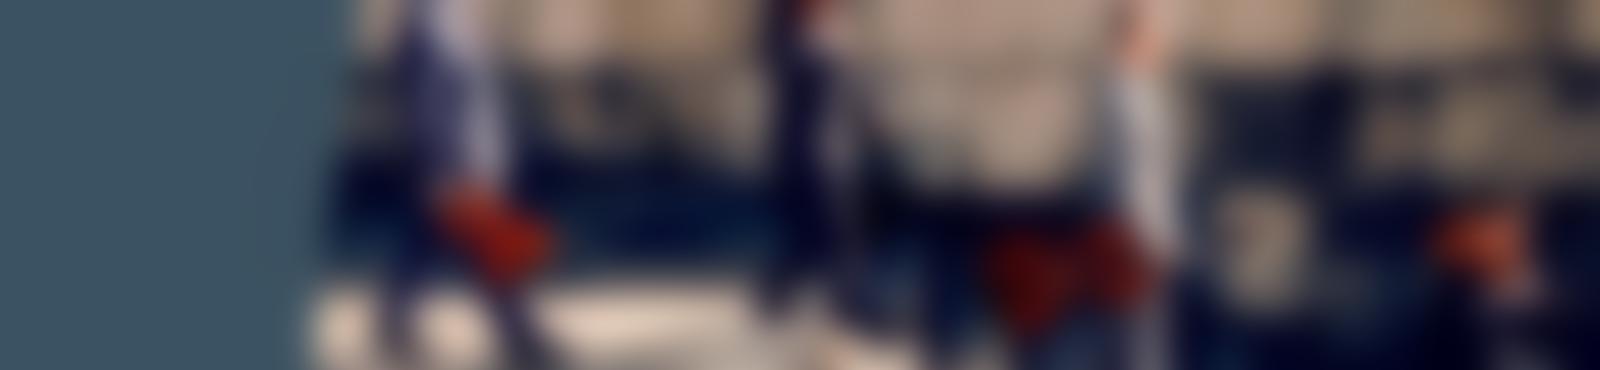 Blurred e8accf8d fd28 4a05 93c8 7219190e36c5